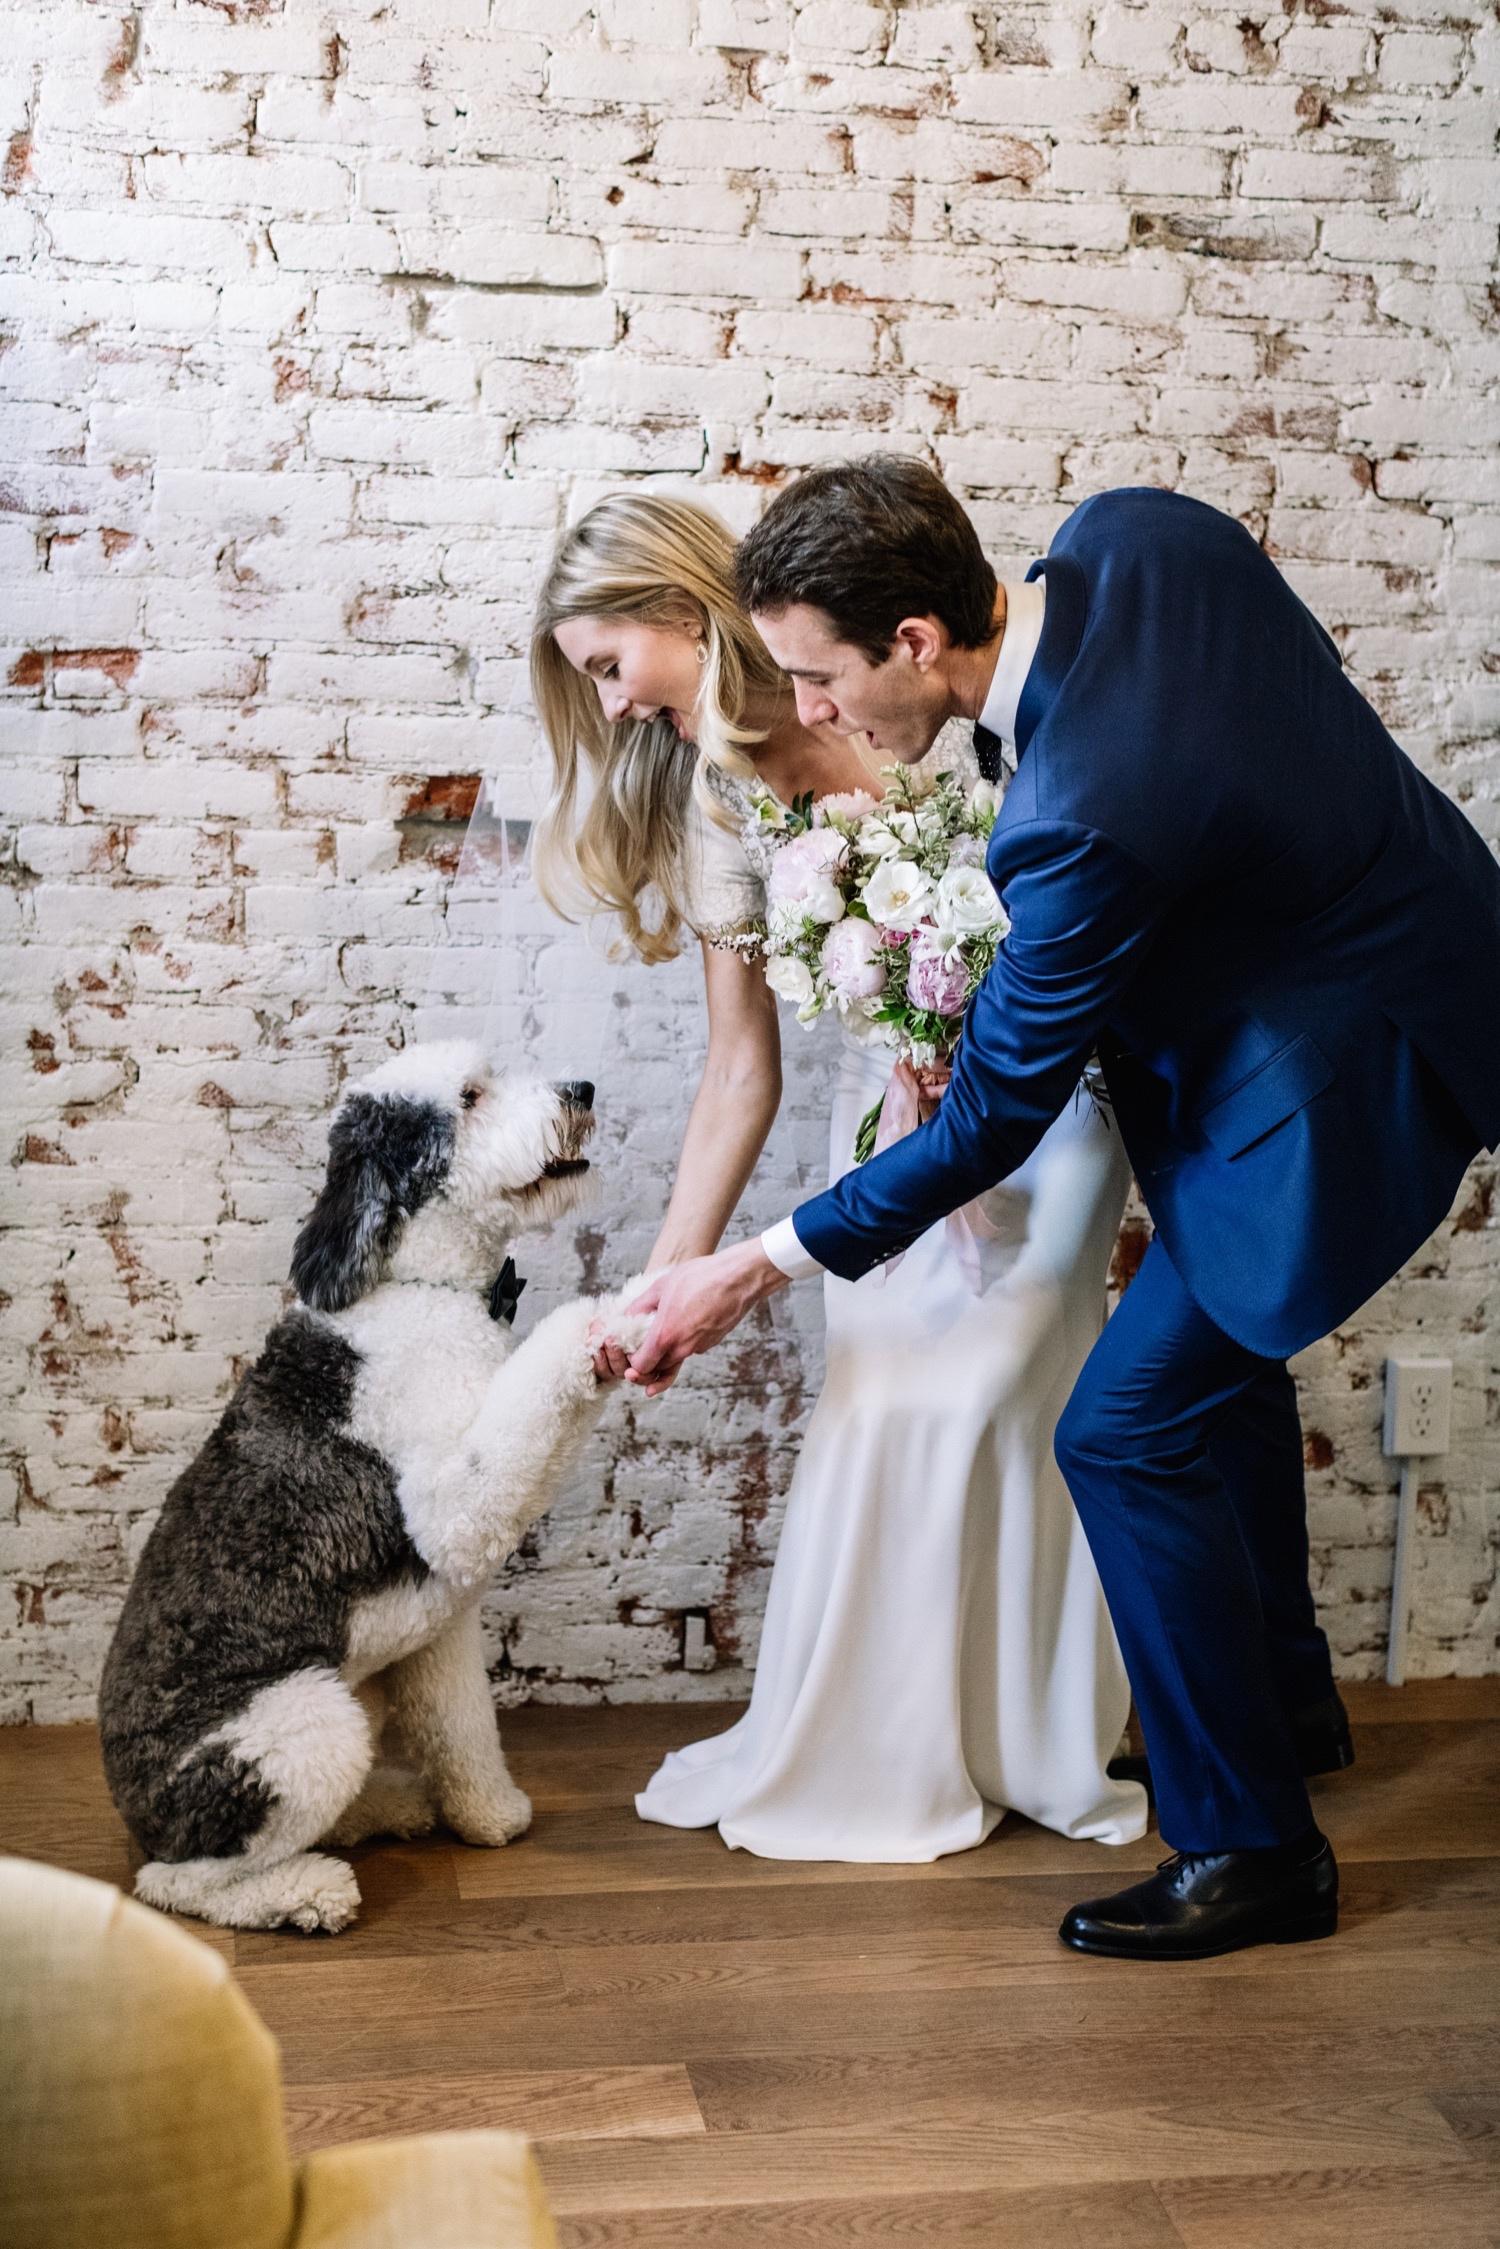 Stylish Wedding Photos with Dogs